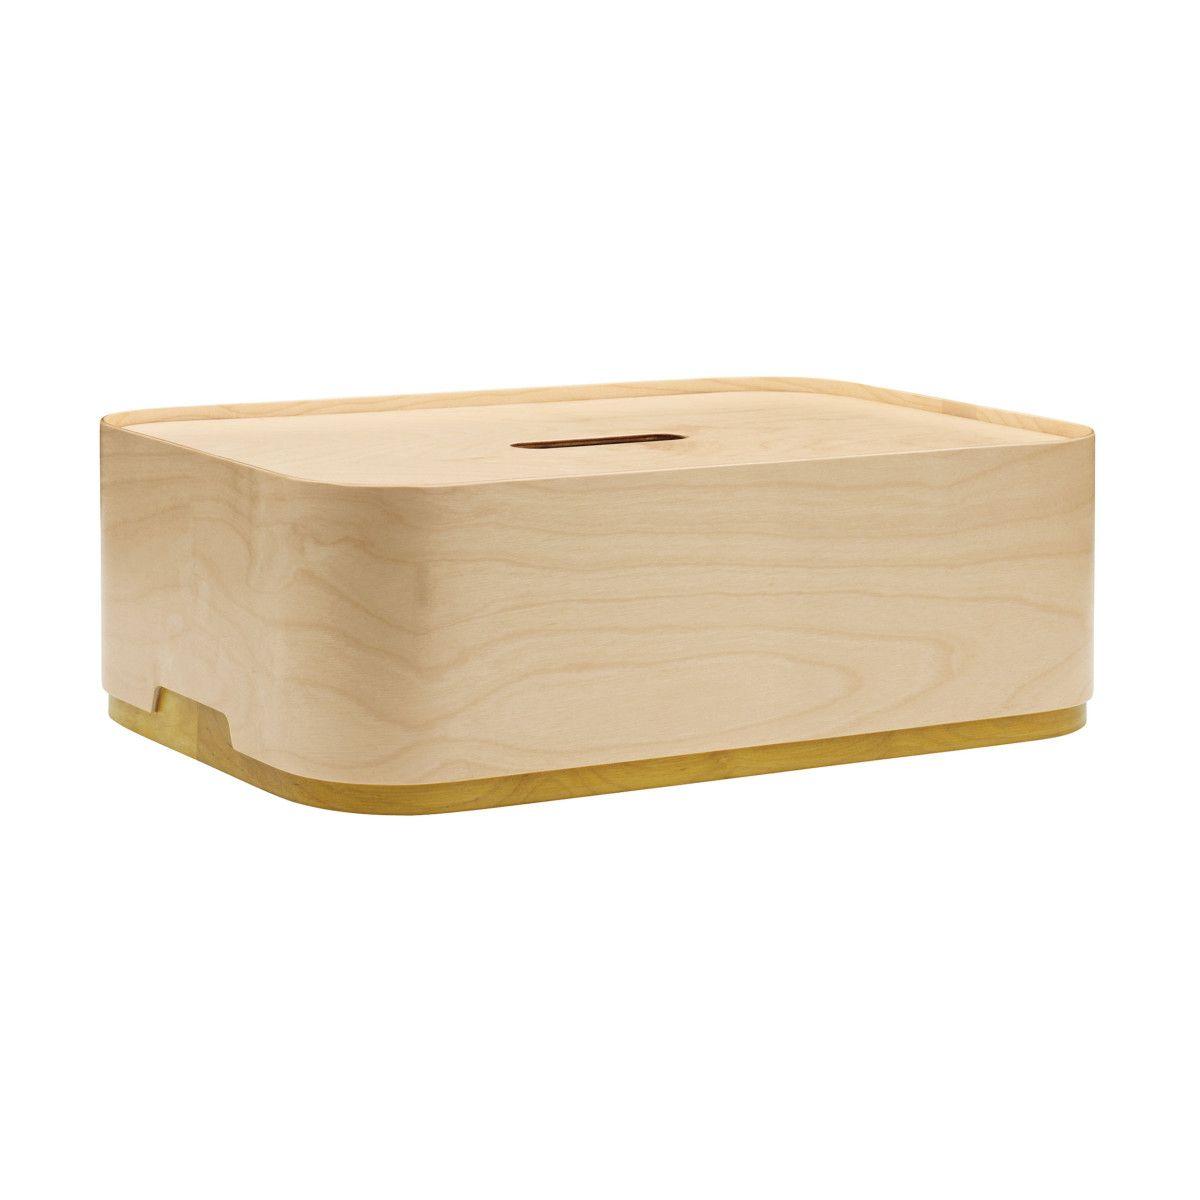 Vakka Aufbewahrungsbox Jetzt bestellen unter: https://moebel.ladendirekt.de/dekoration/aufbewahrung/kaestchen/?uid=1ccc3fa8-ff2a-5a45-ba8e-62b03cb8d743&utm_source=pinterest&utm_medium=pin&utm_campaign=boards #aufbewahrung #kaestchen #dekoration